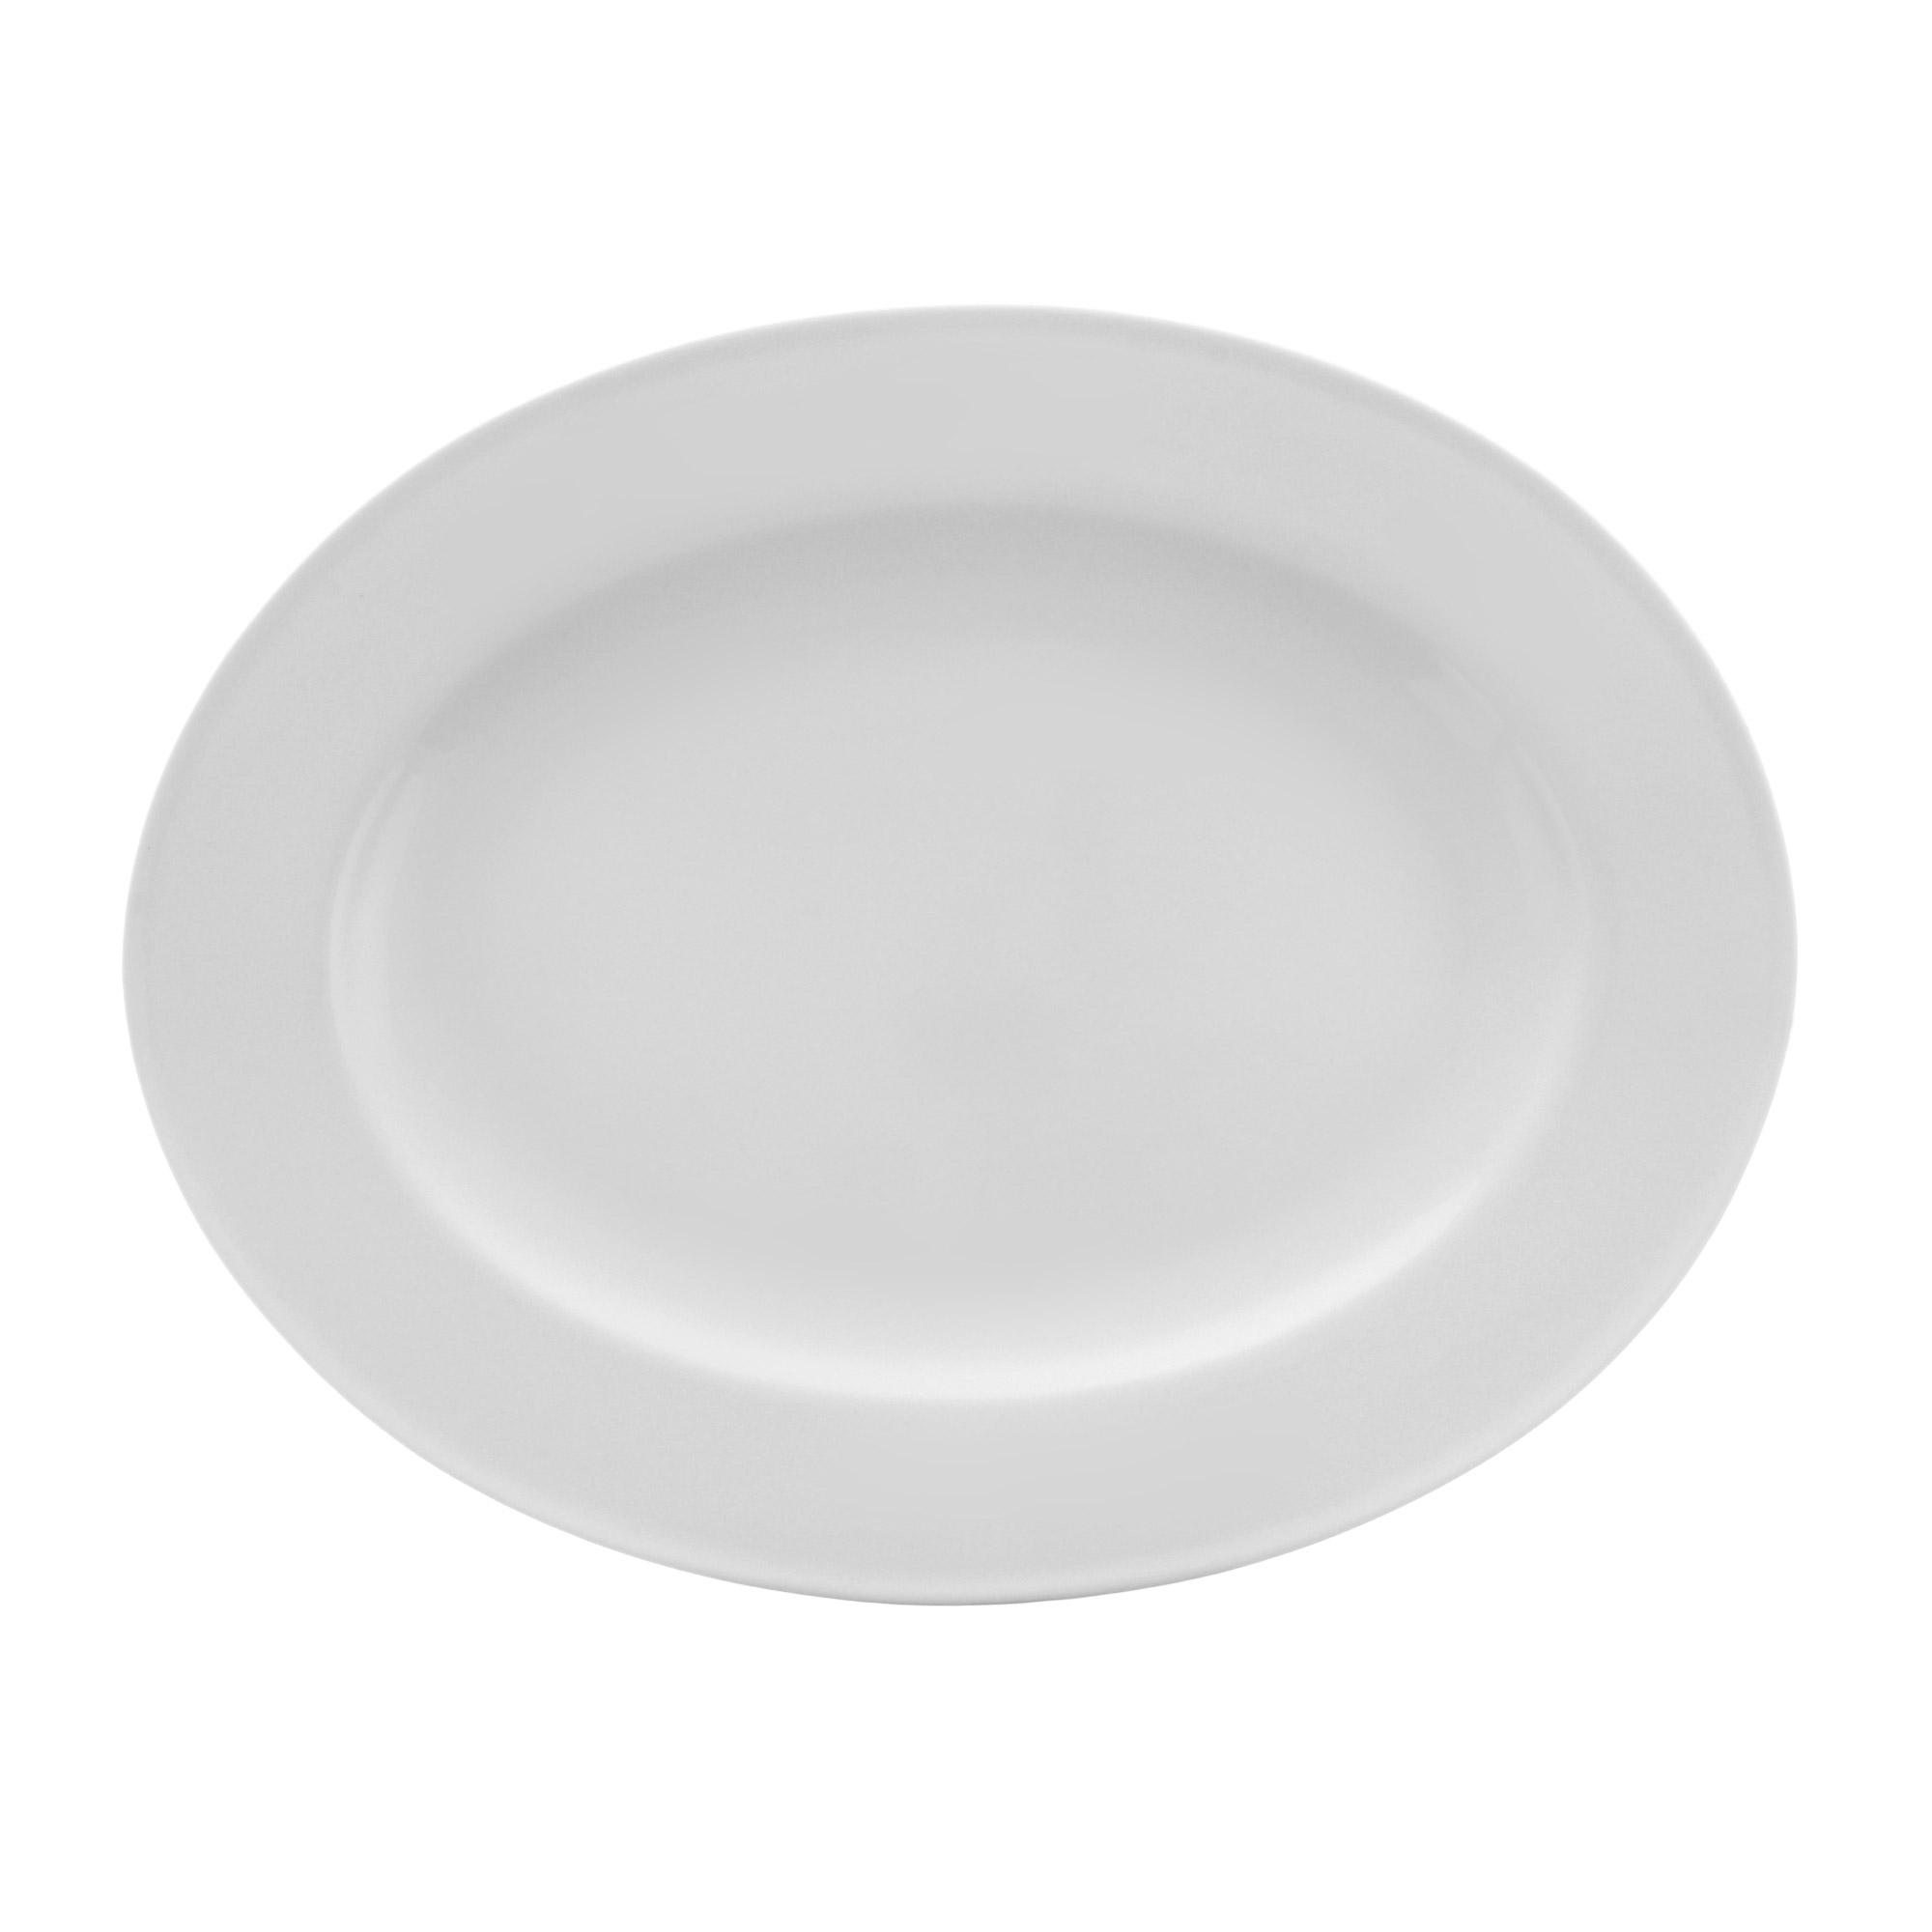 Тарелка овальная Monno Элемент 36 см